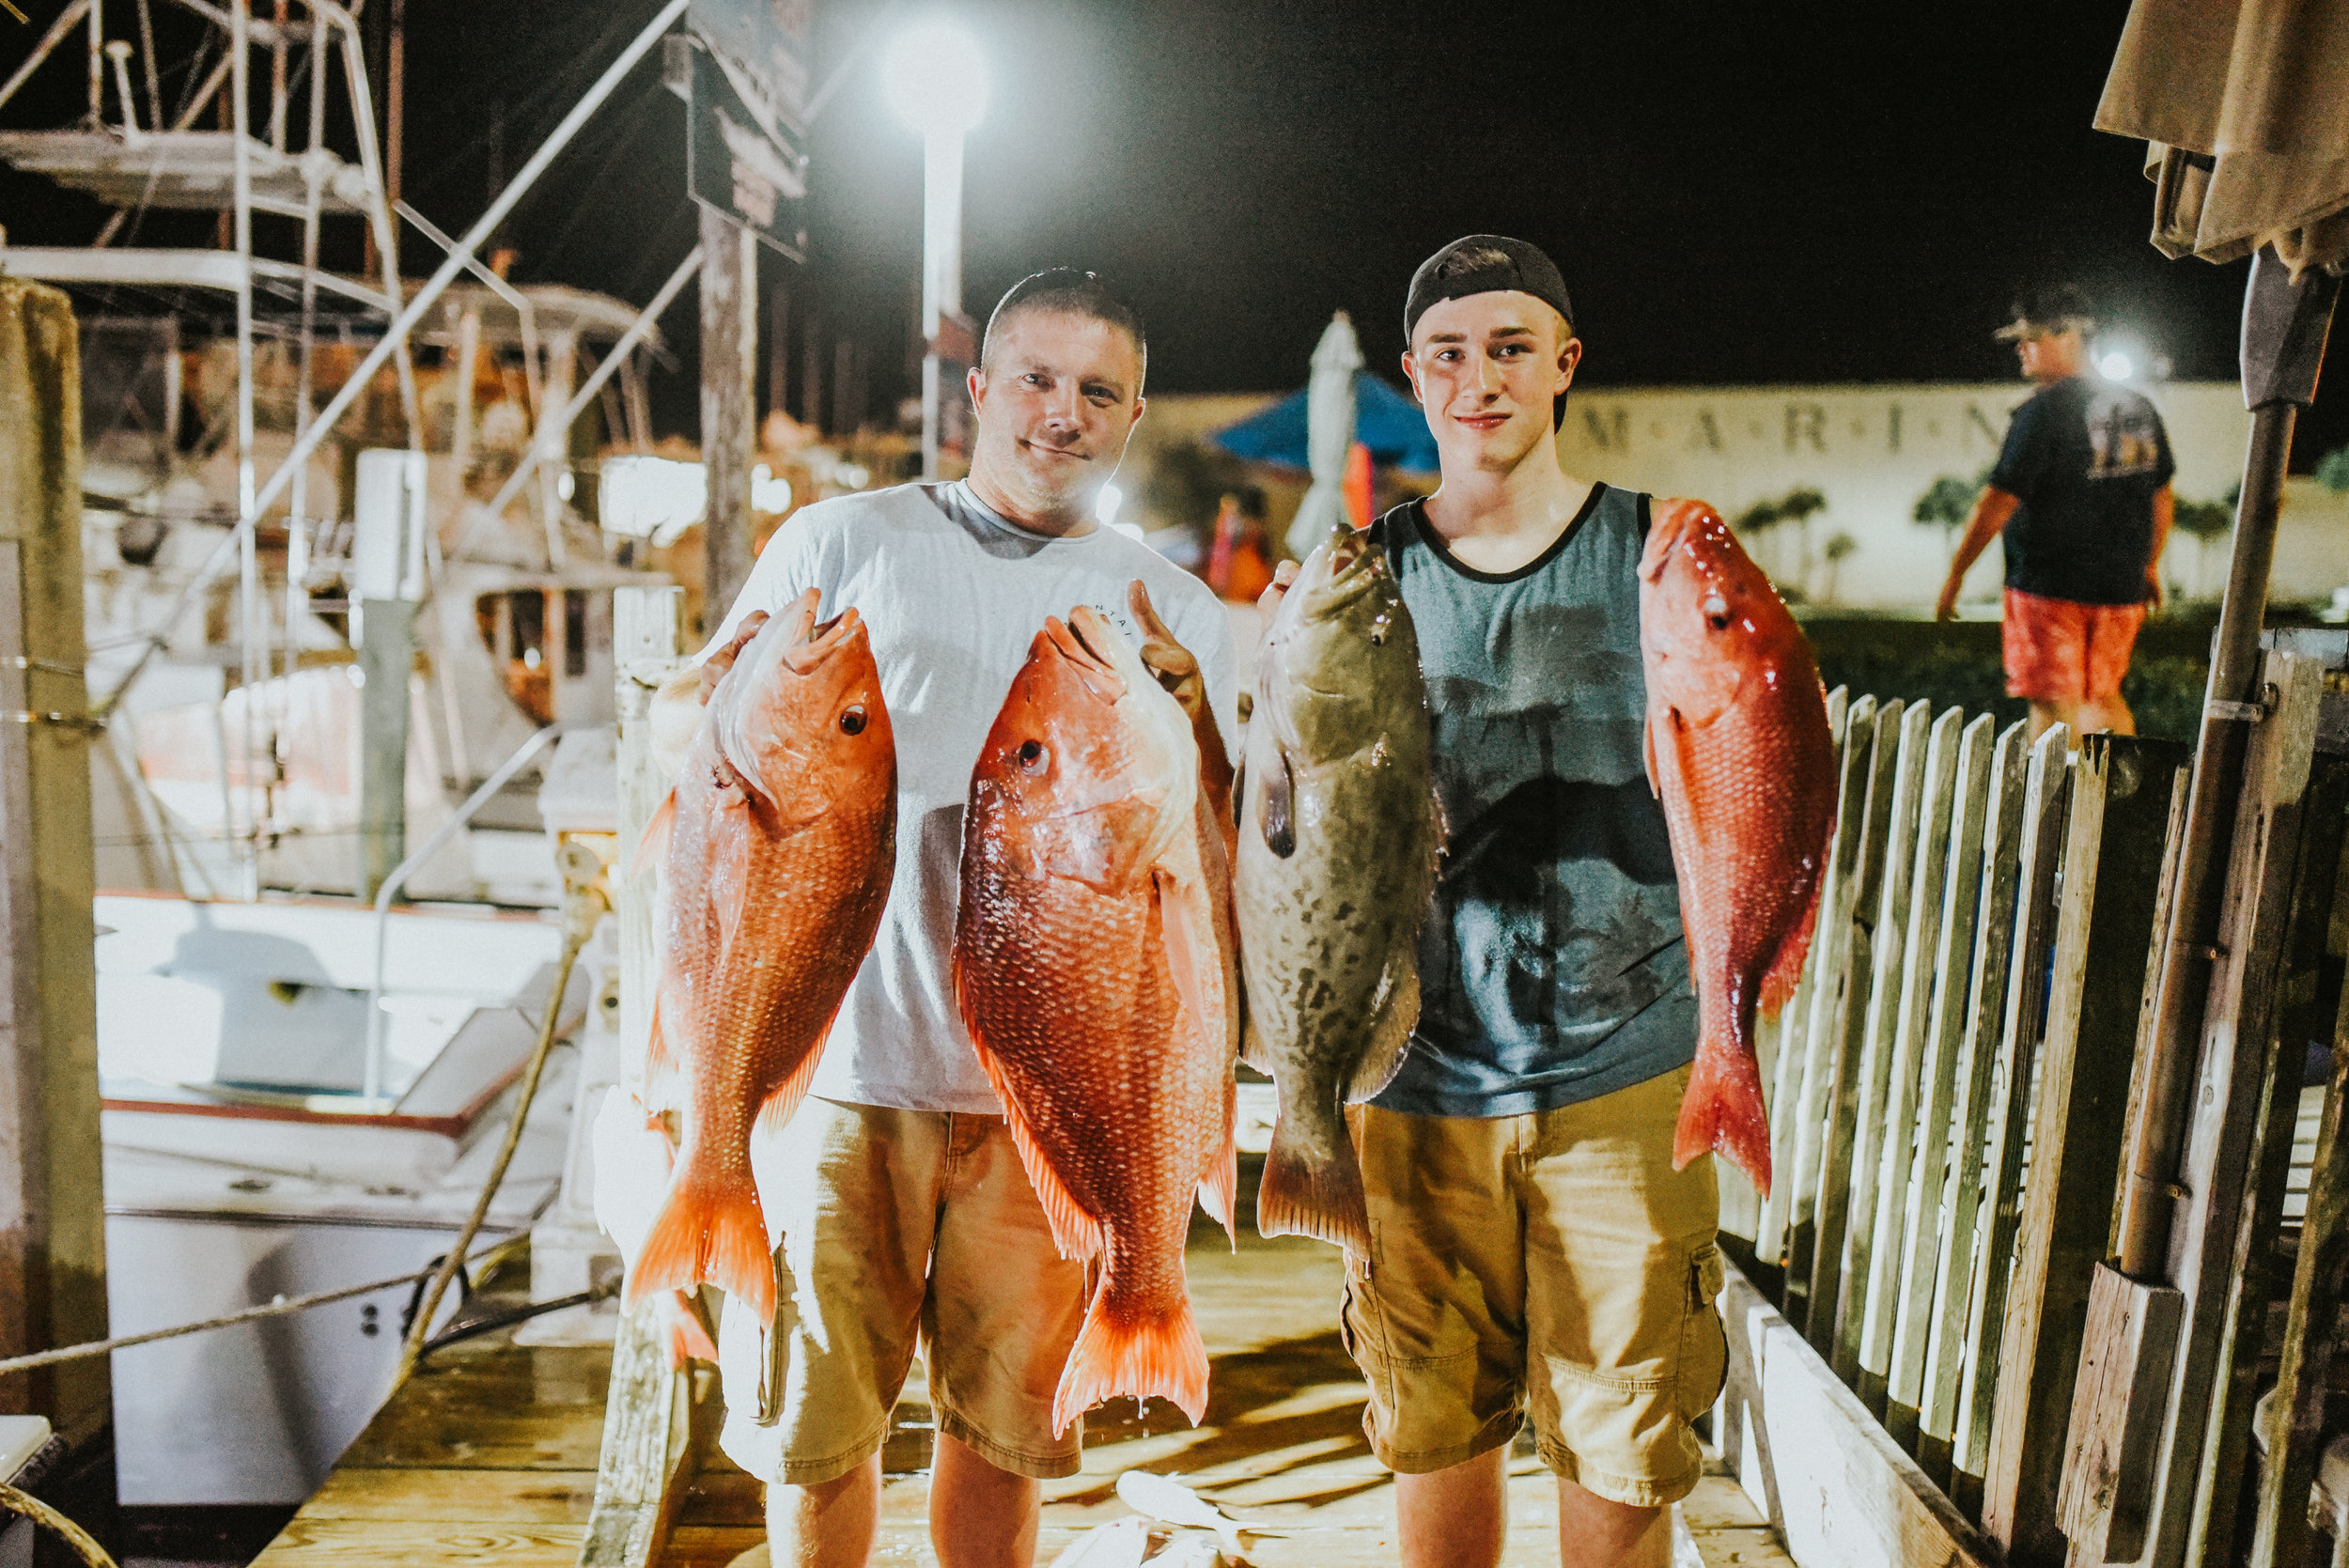 Panama-City-Charter-Fishing-Seawolf-Destin-Deep-Sea-Red-Snapper-Grouper